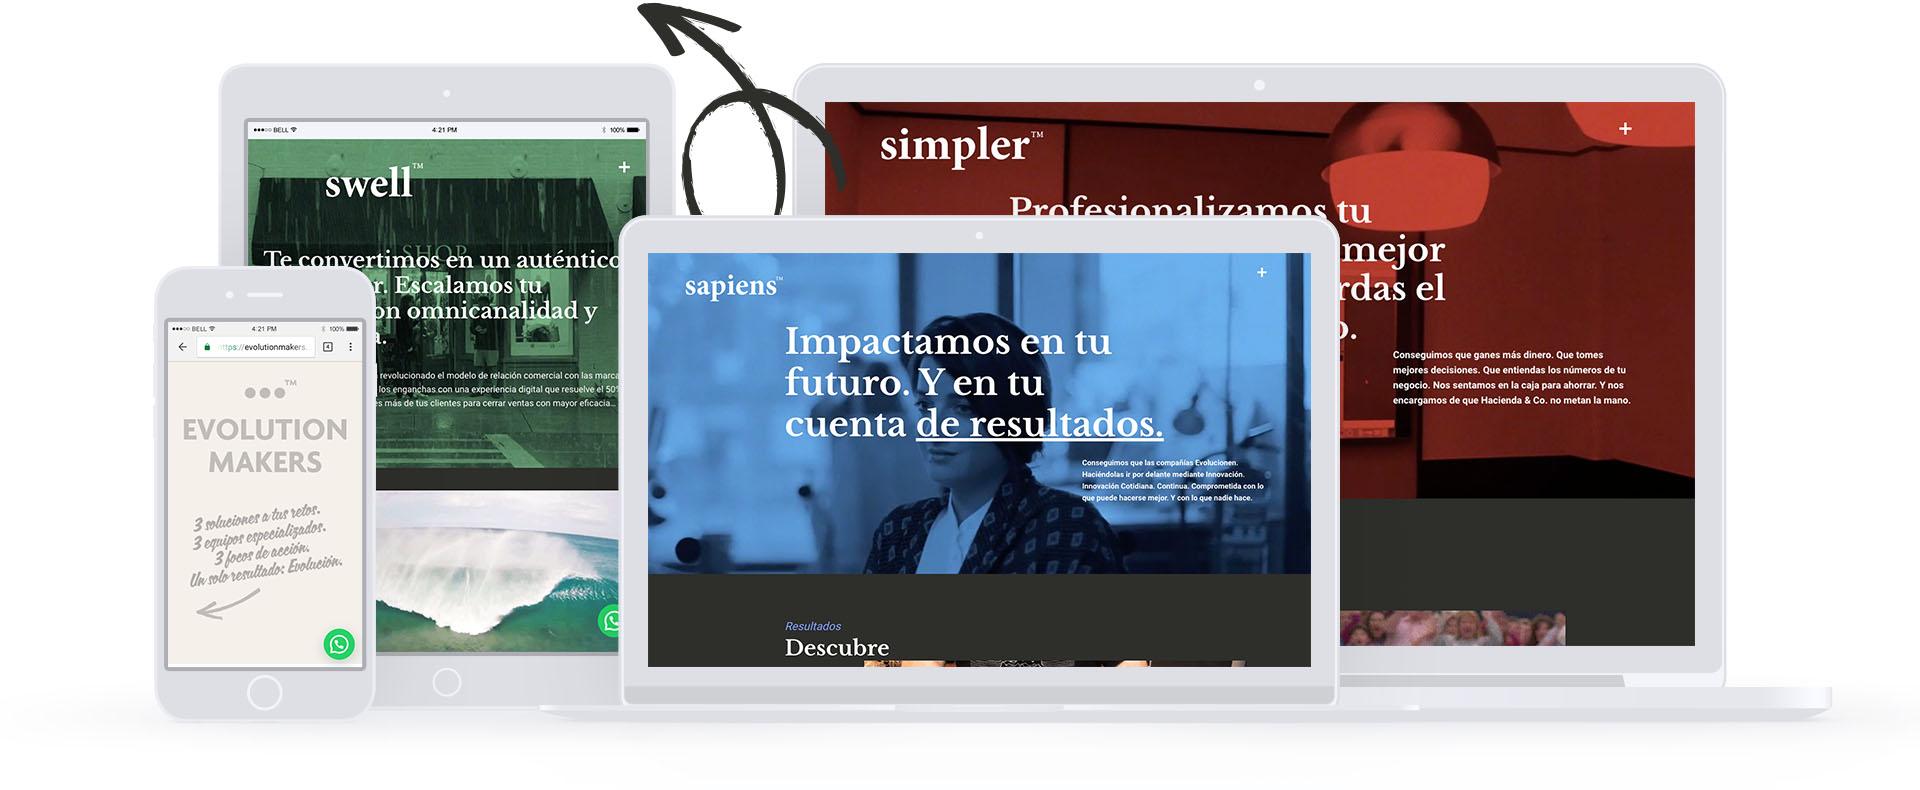 Diseño_web_sub_marcas_evolutions_makers